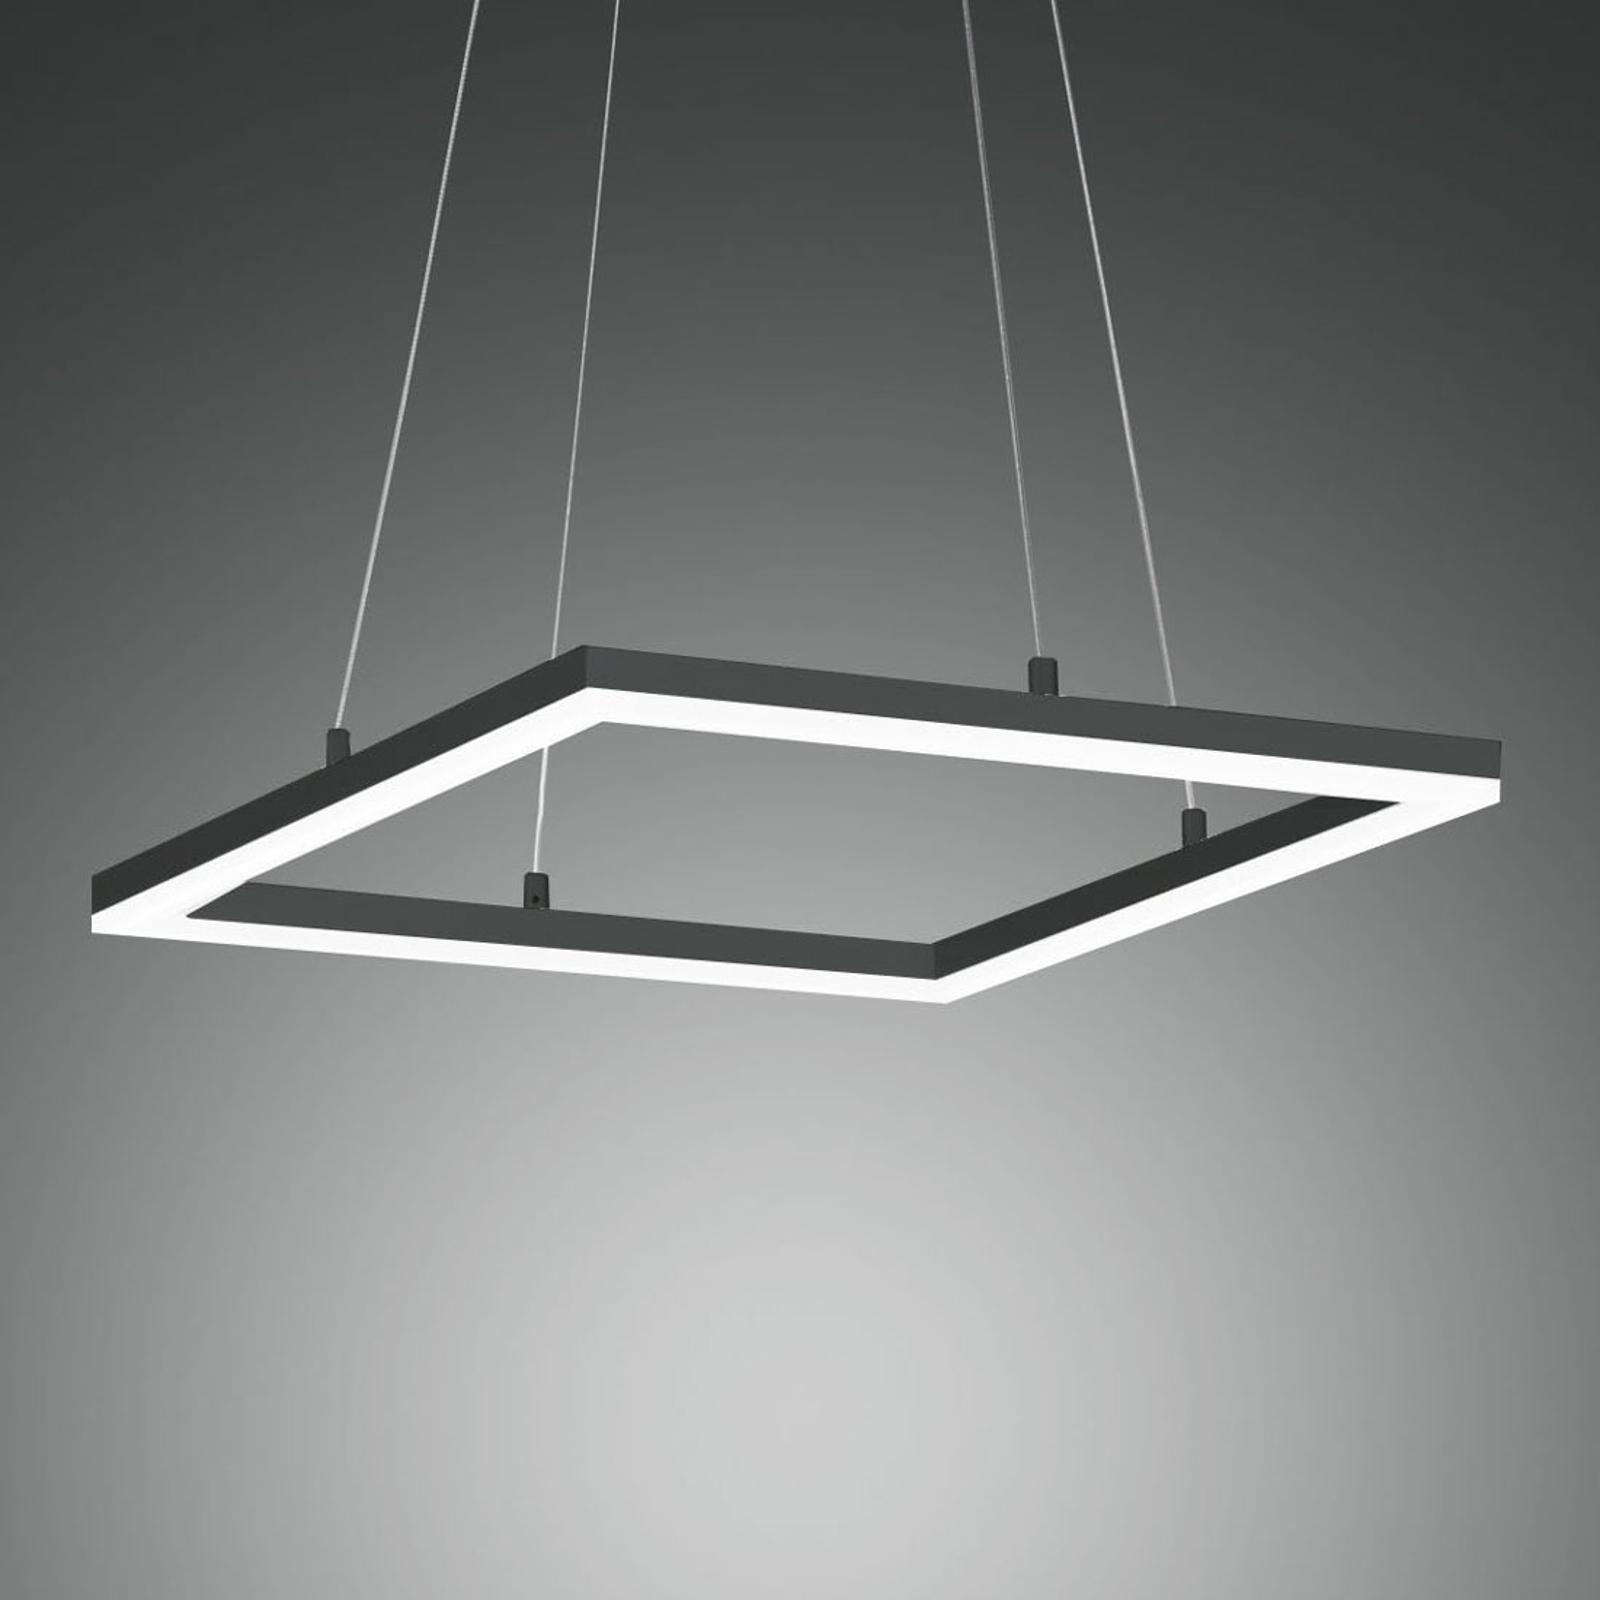 Suspension LED Bard 42x42cm, anthracite